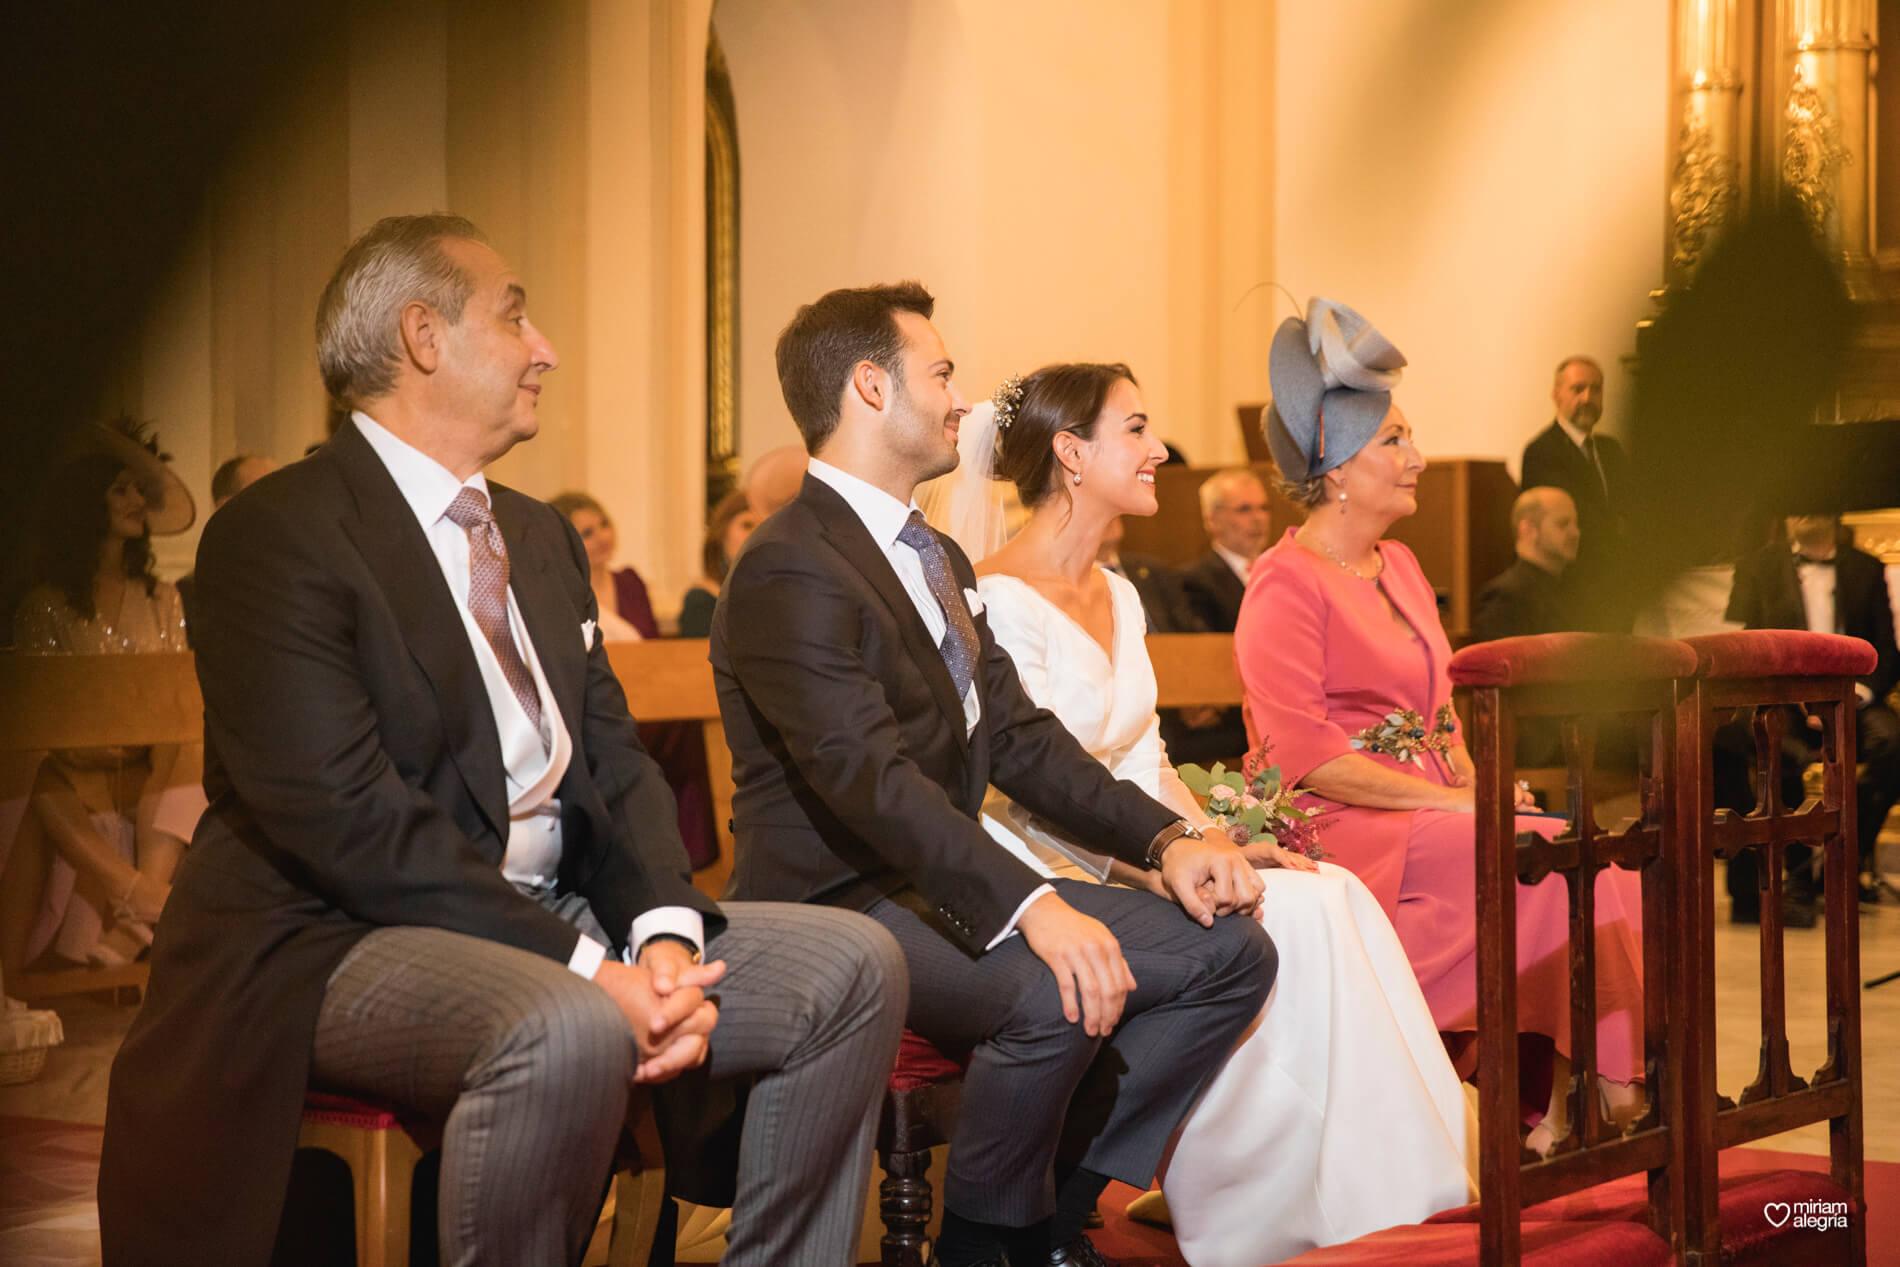 vestido-de-novia-paula-del-vas-miriam-alegria-fotografos-boda-murcia-54